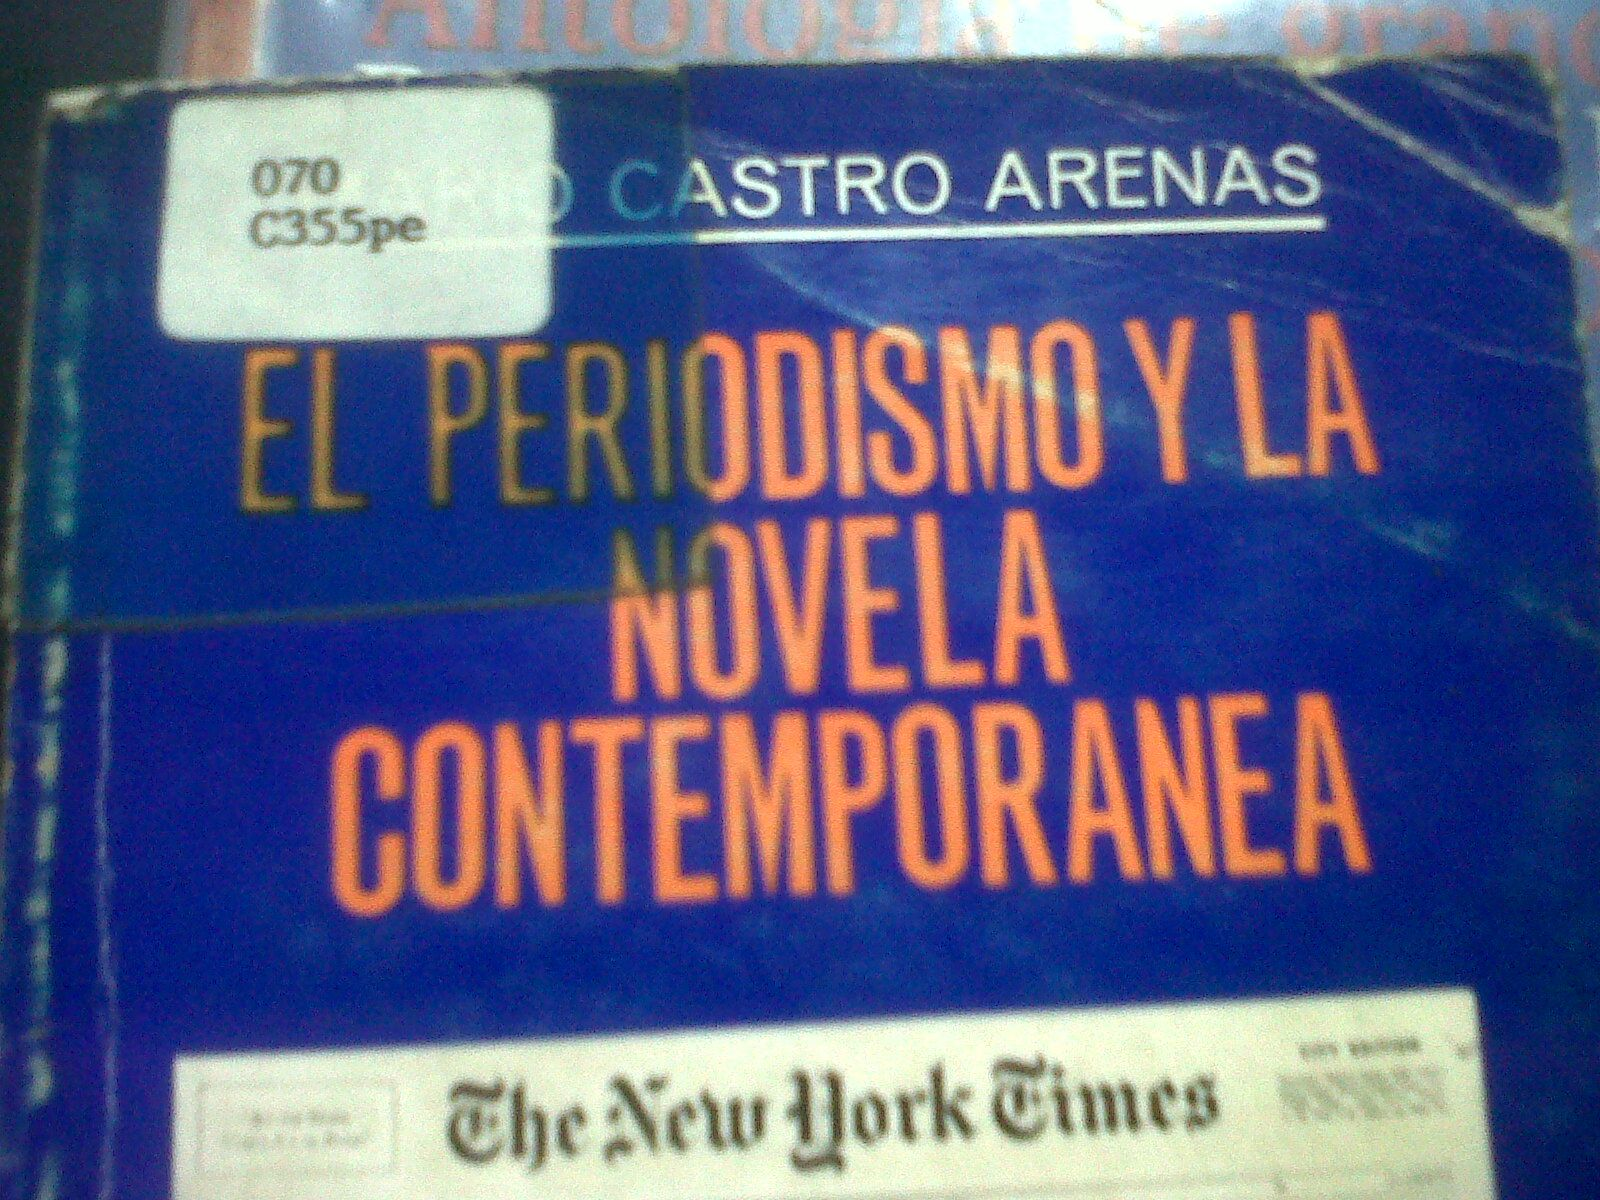 El Periodismo Y La Novela Contemporanea Novela Contemporanea Novelas Libros